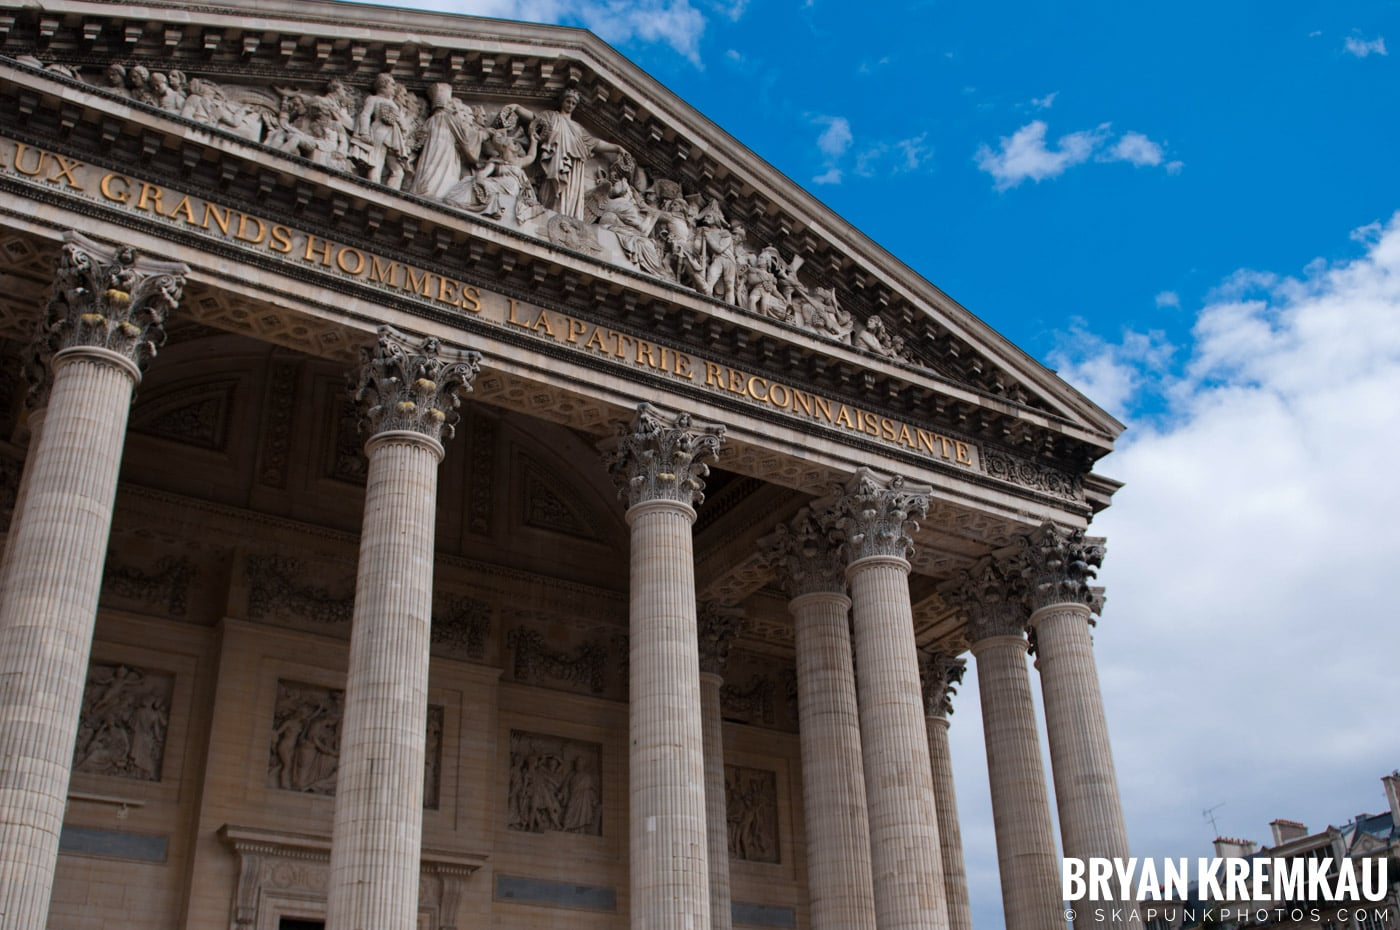 Paris, France Honeymoon - Day 1 - 7.18.11 (56)